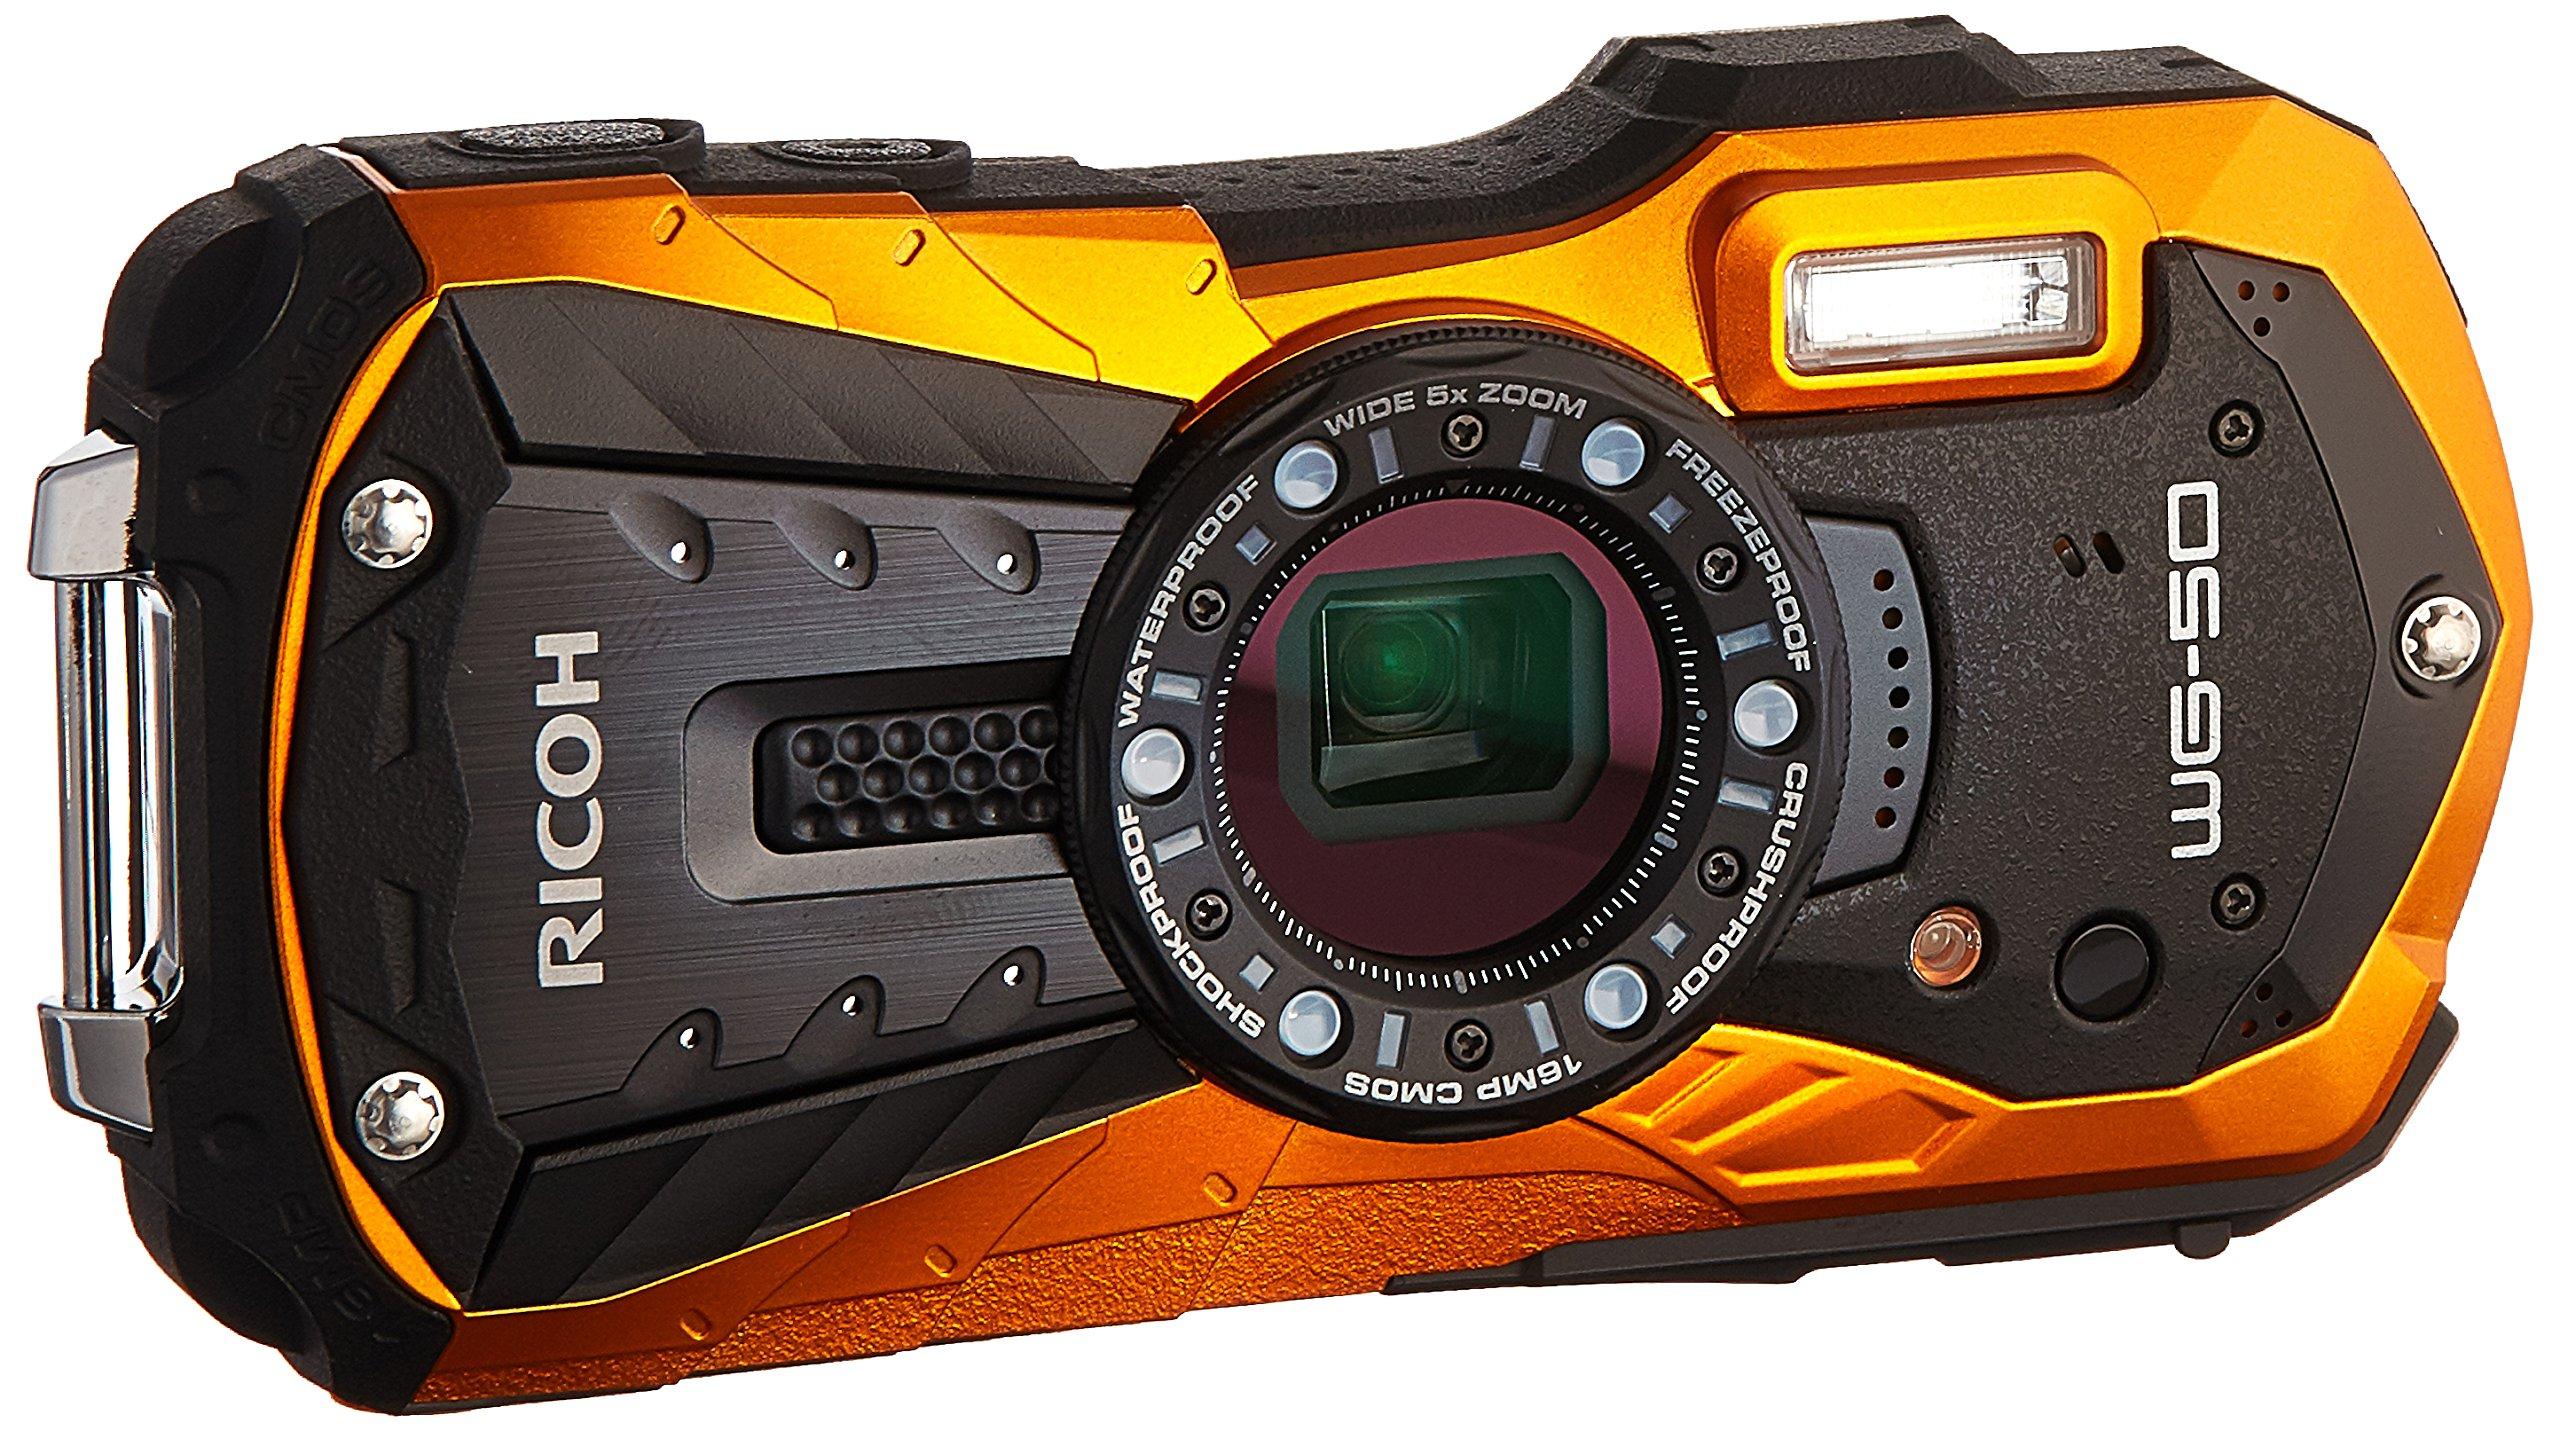 Ricoh 16 Waterproof Still/Video Camera Digital with 2.7'' LCD, Orange (WG-50 orange) by Ricoh